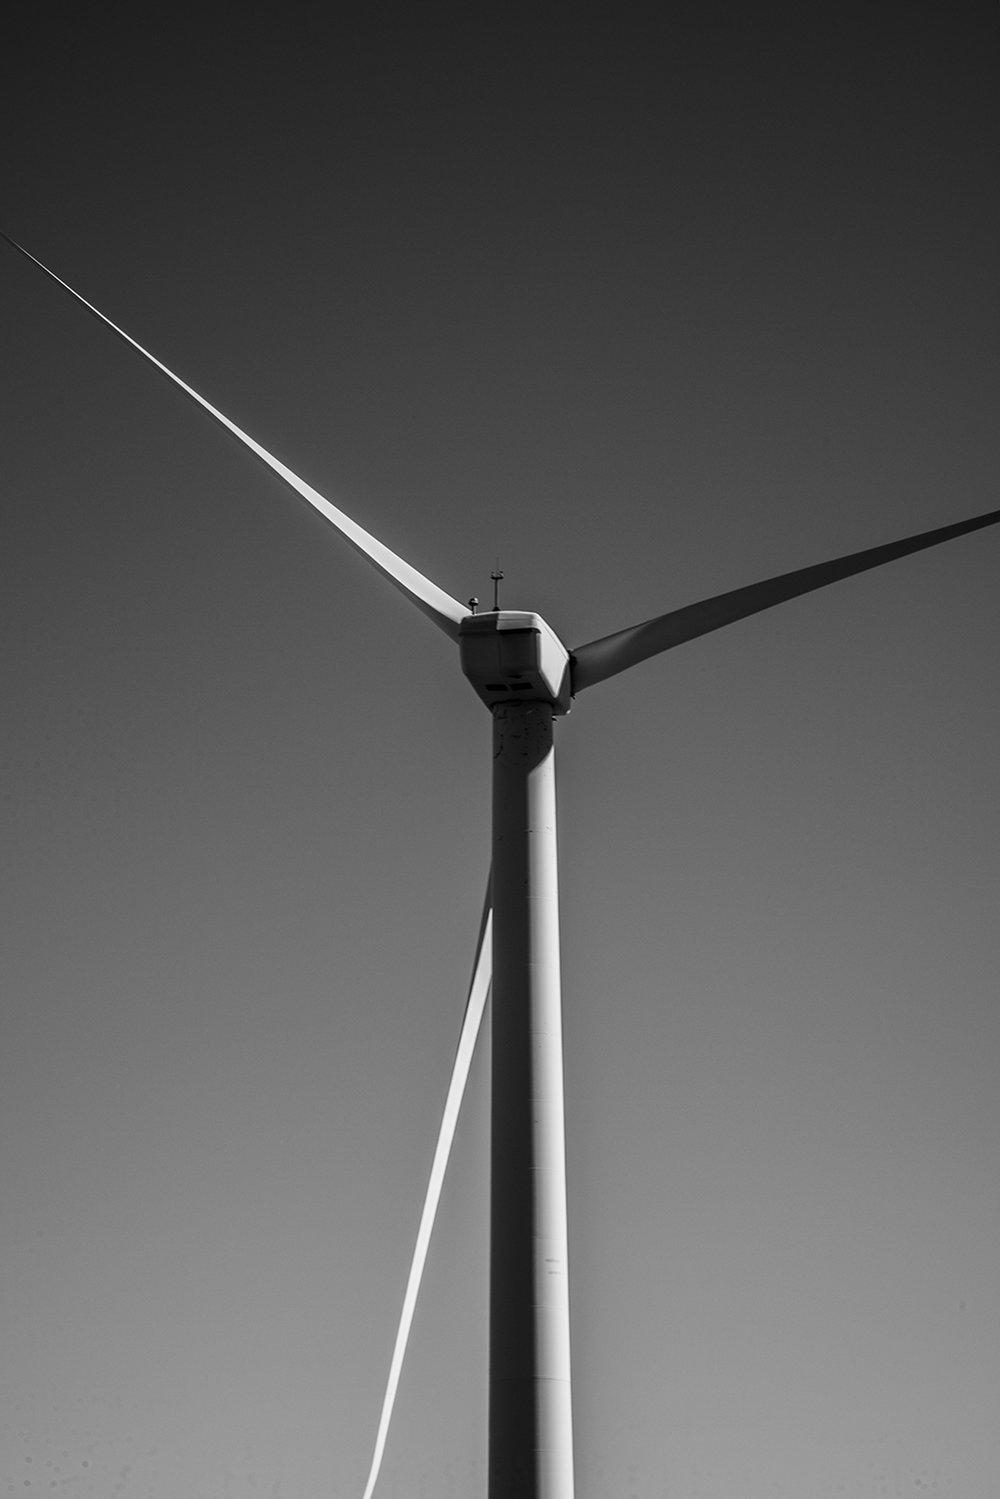 Wind_17.jpg